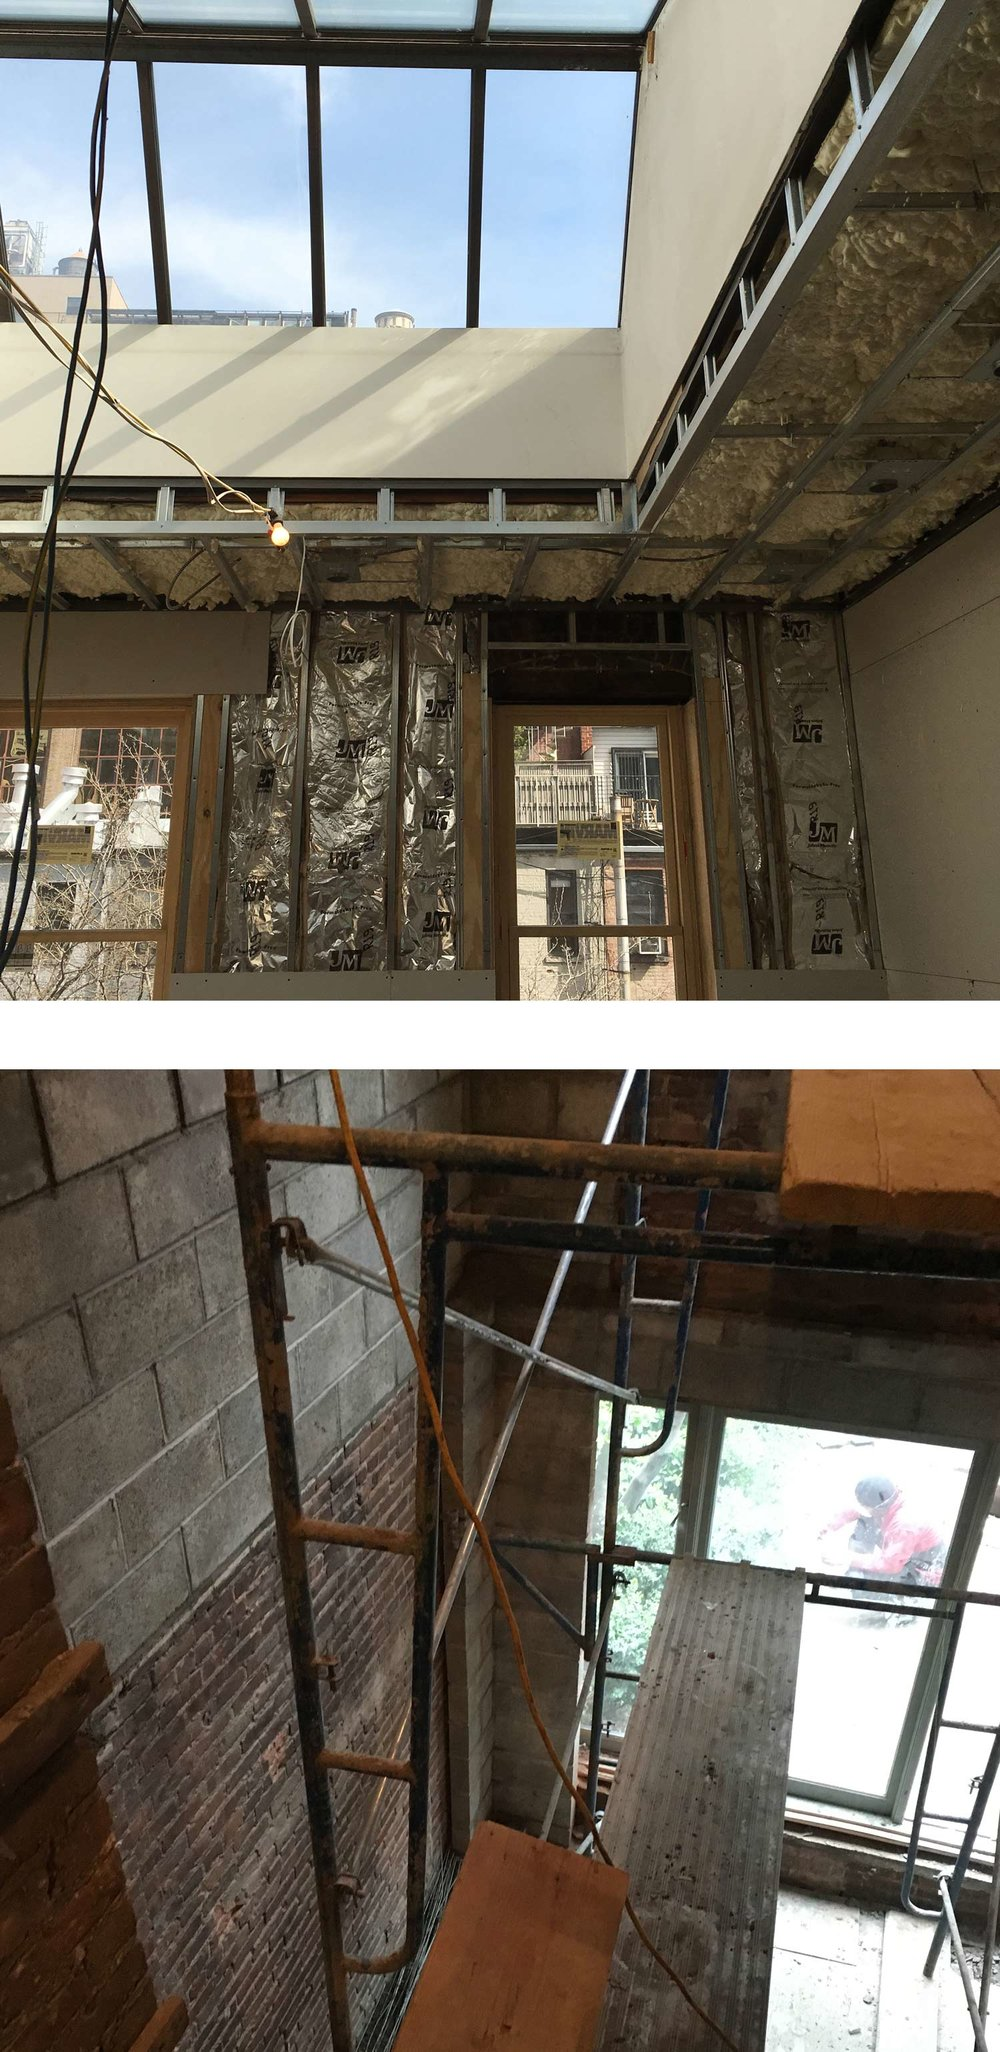 New York Townhouse Renovation - Photos during construction